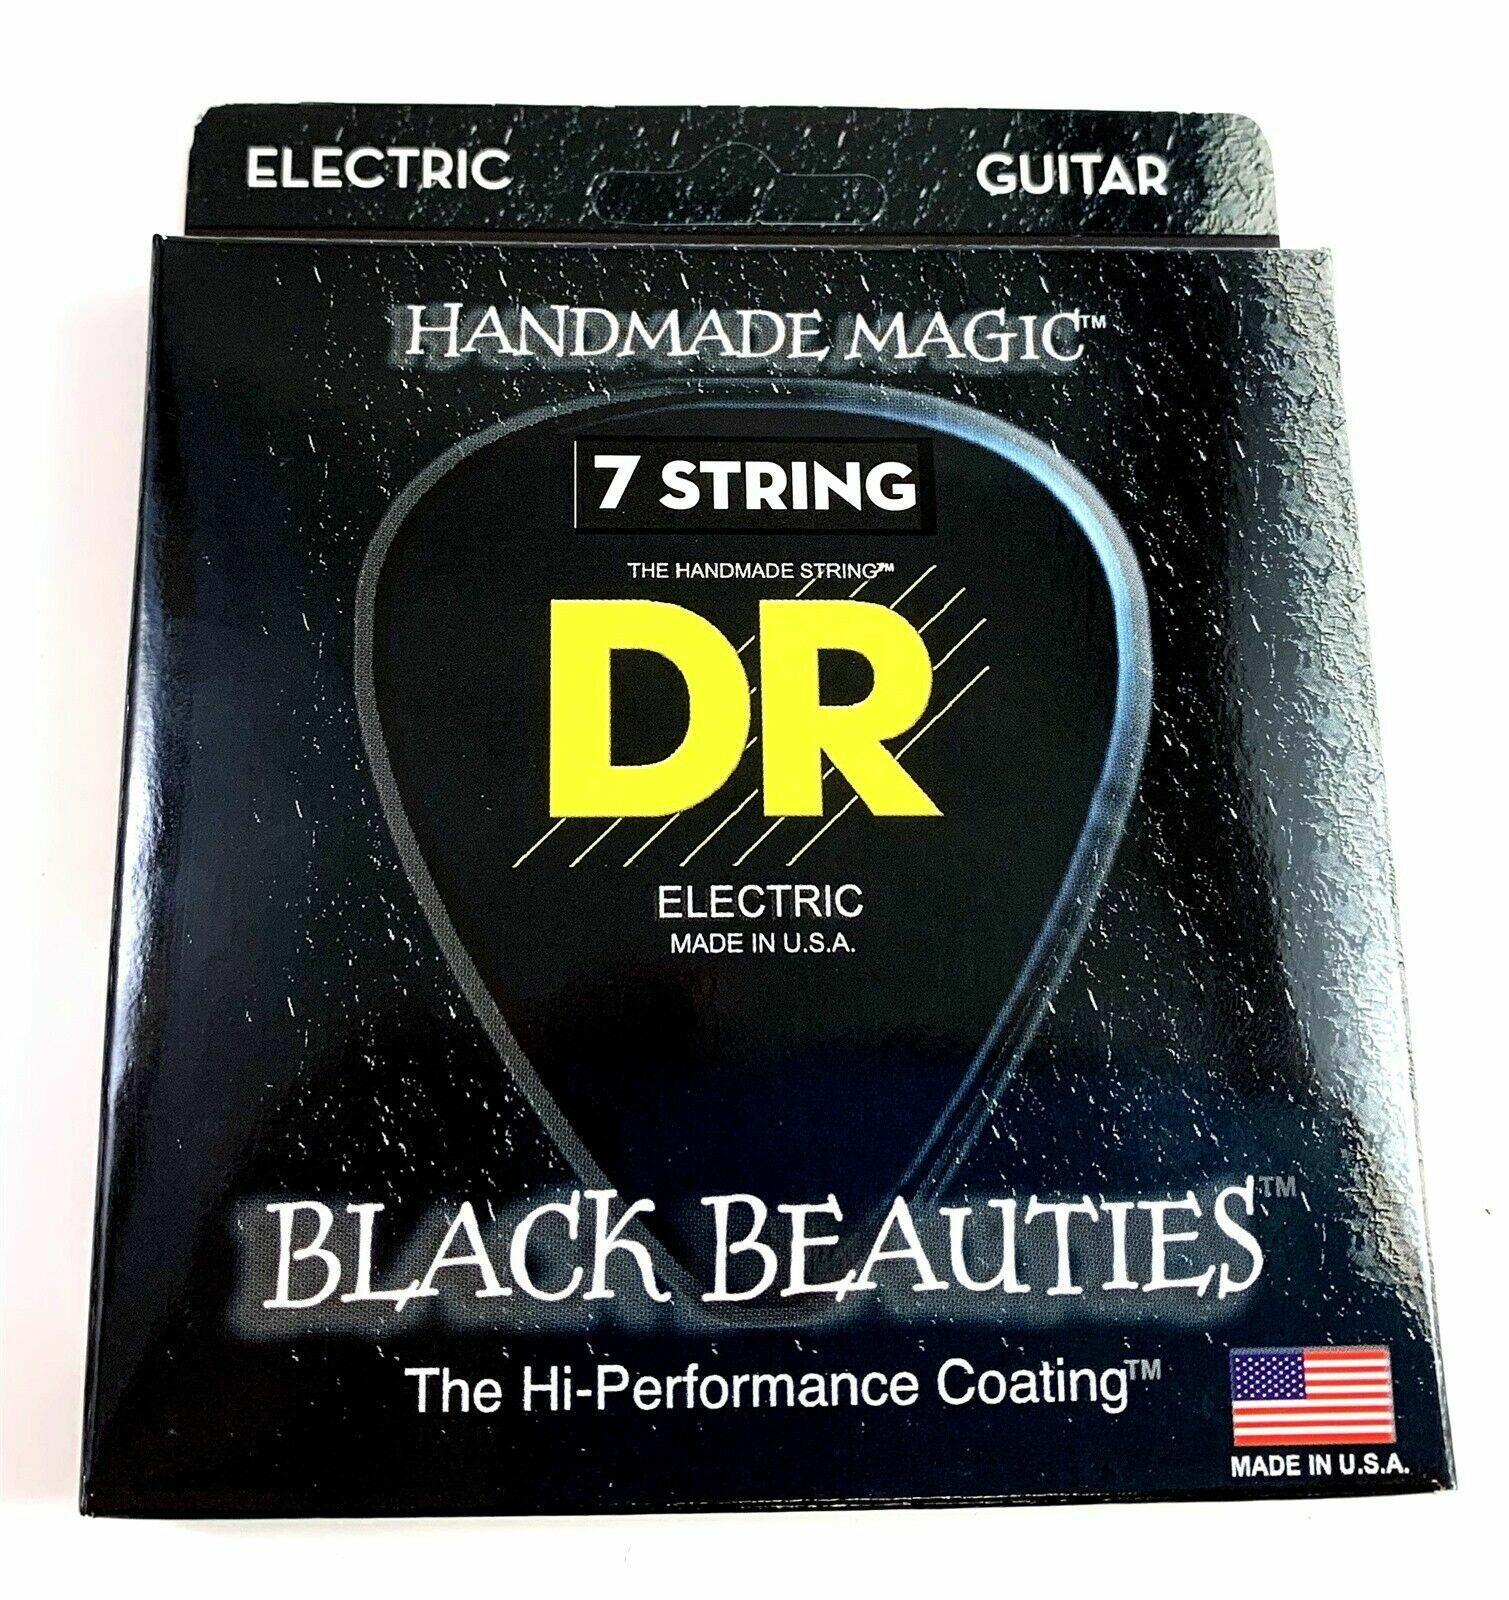 DR BKE7-11 Extra Life Black Beauties Coated Guitar Strings 11-60 7-string set